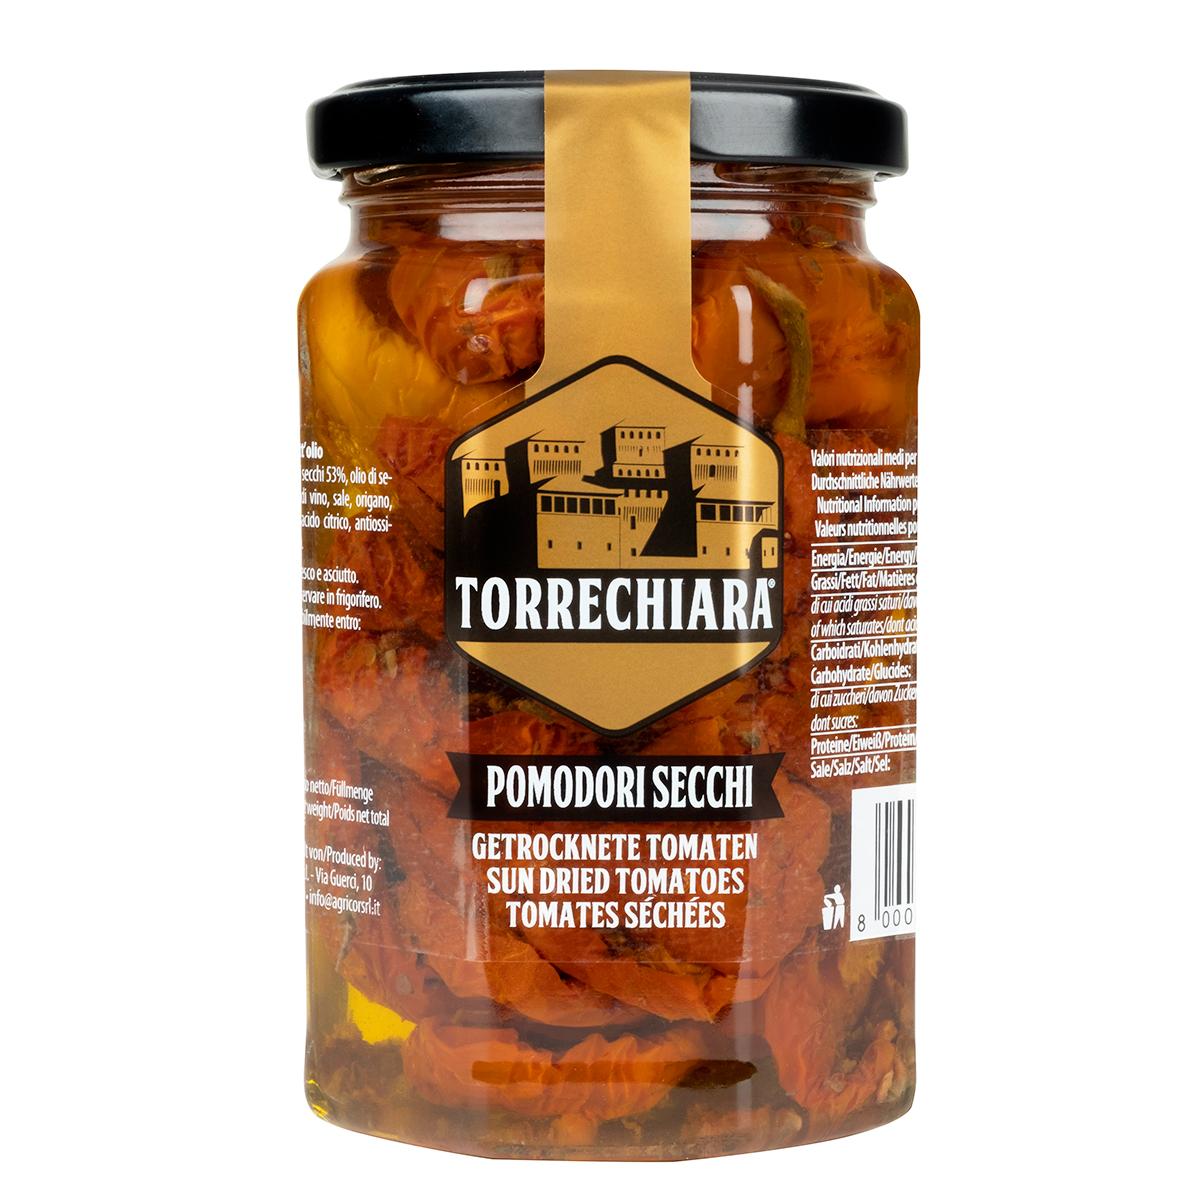 Torrechiara_Pomodori_Secchi-314ml